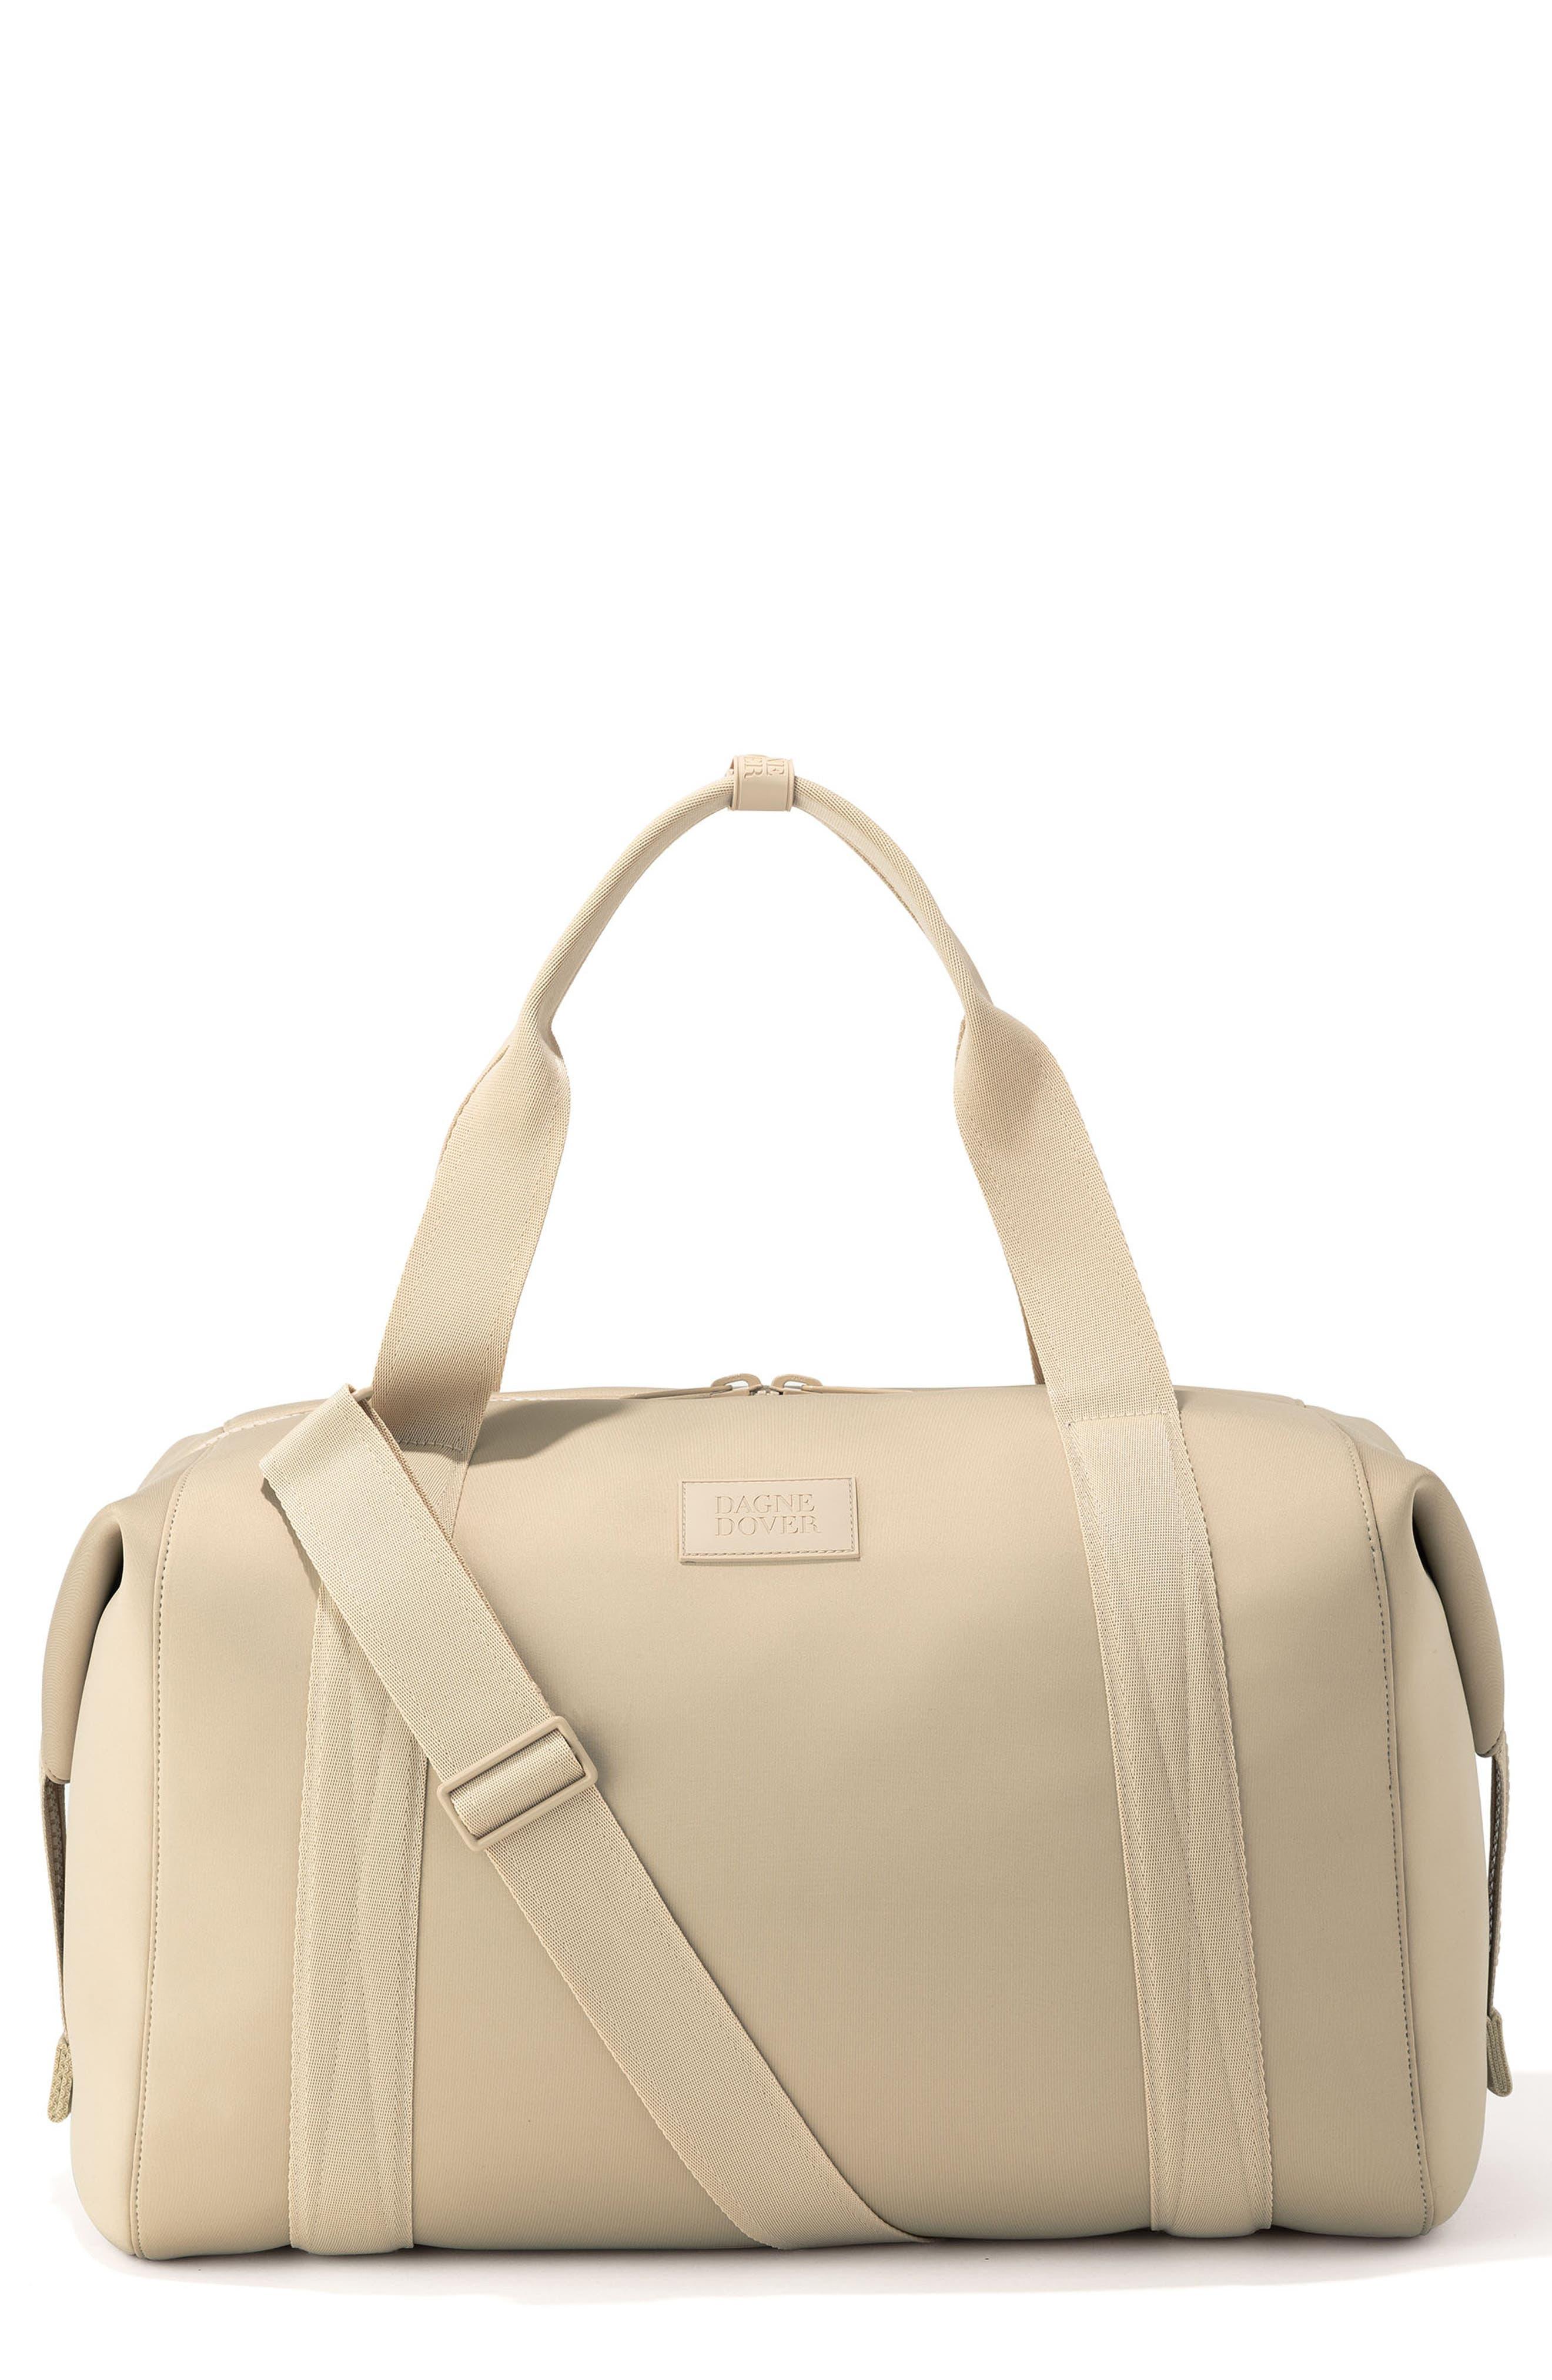 DAGNE DOVER, XL Landon Carryall Duffel Bag, Main thumbnail 1, color, ALMOND LATTE